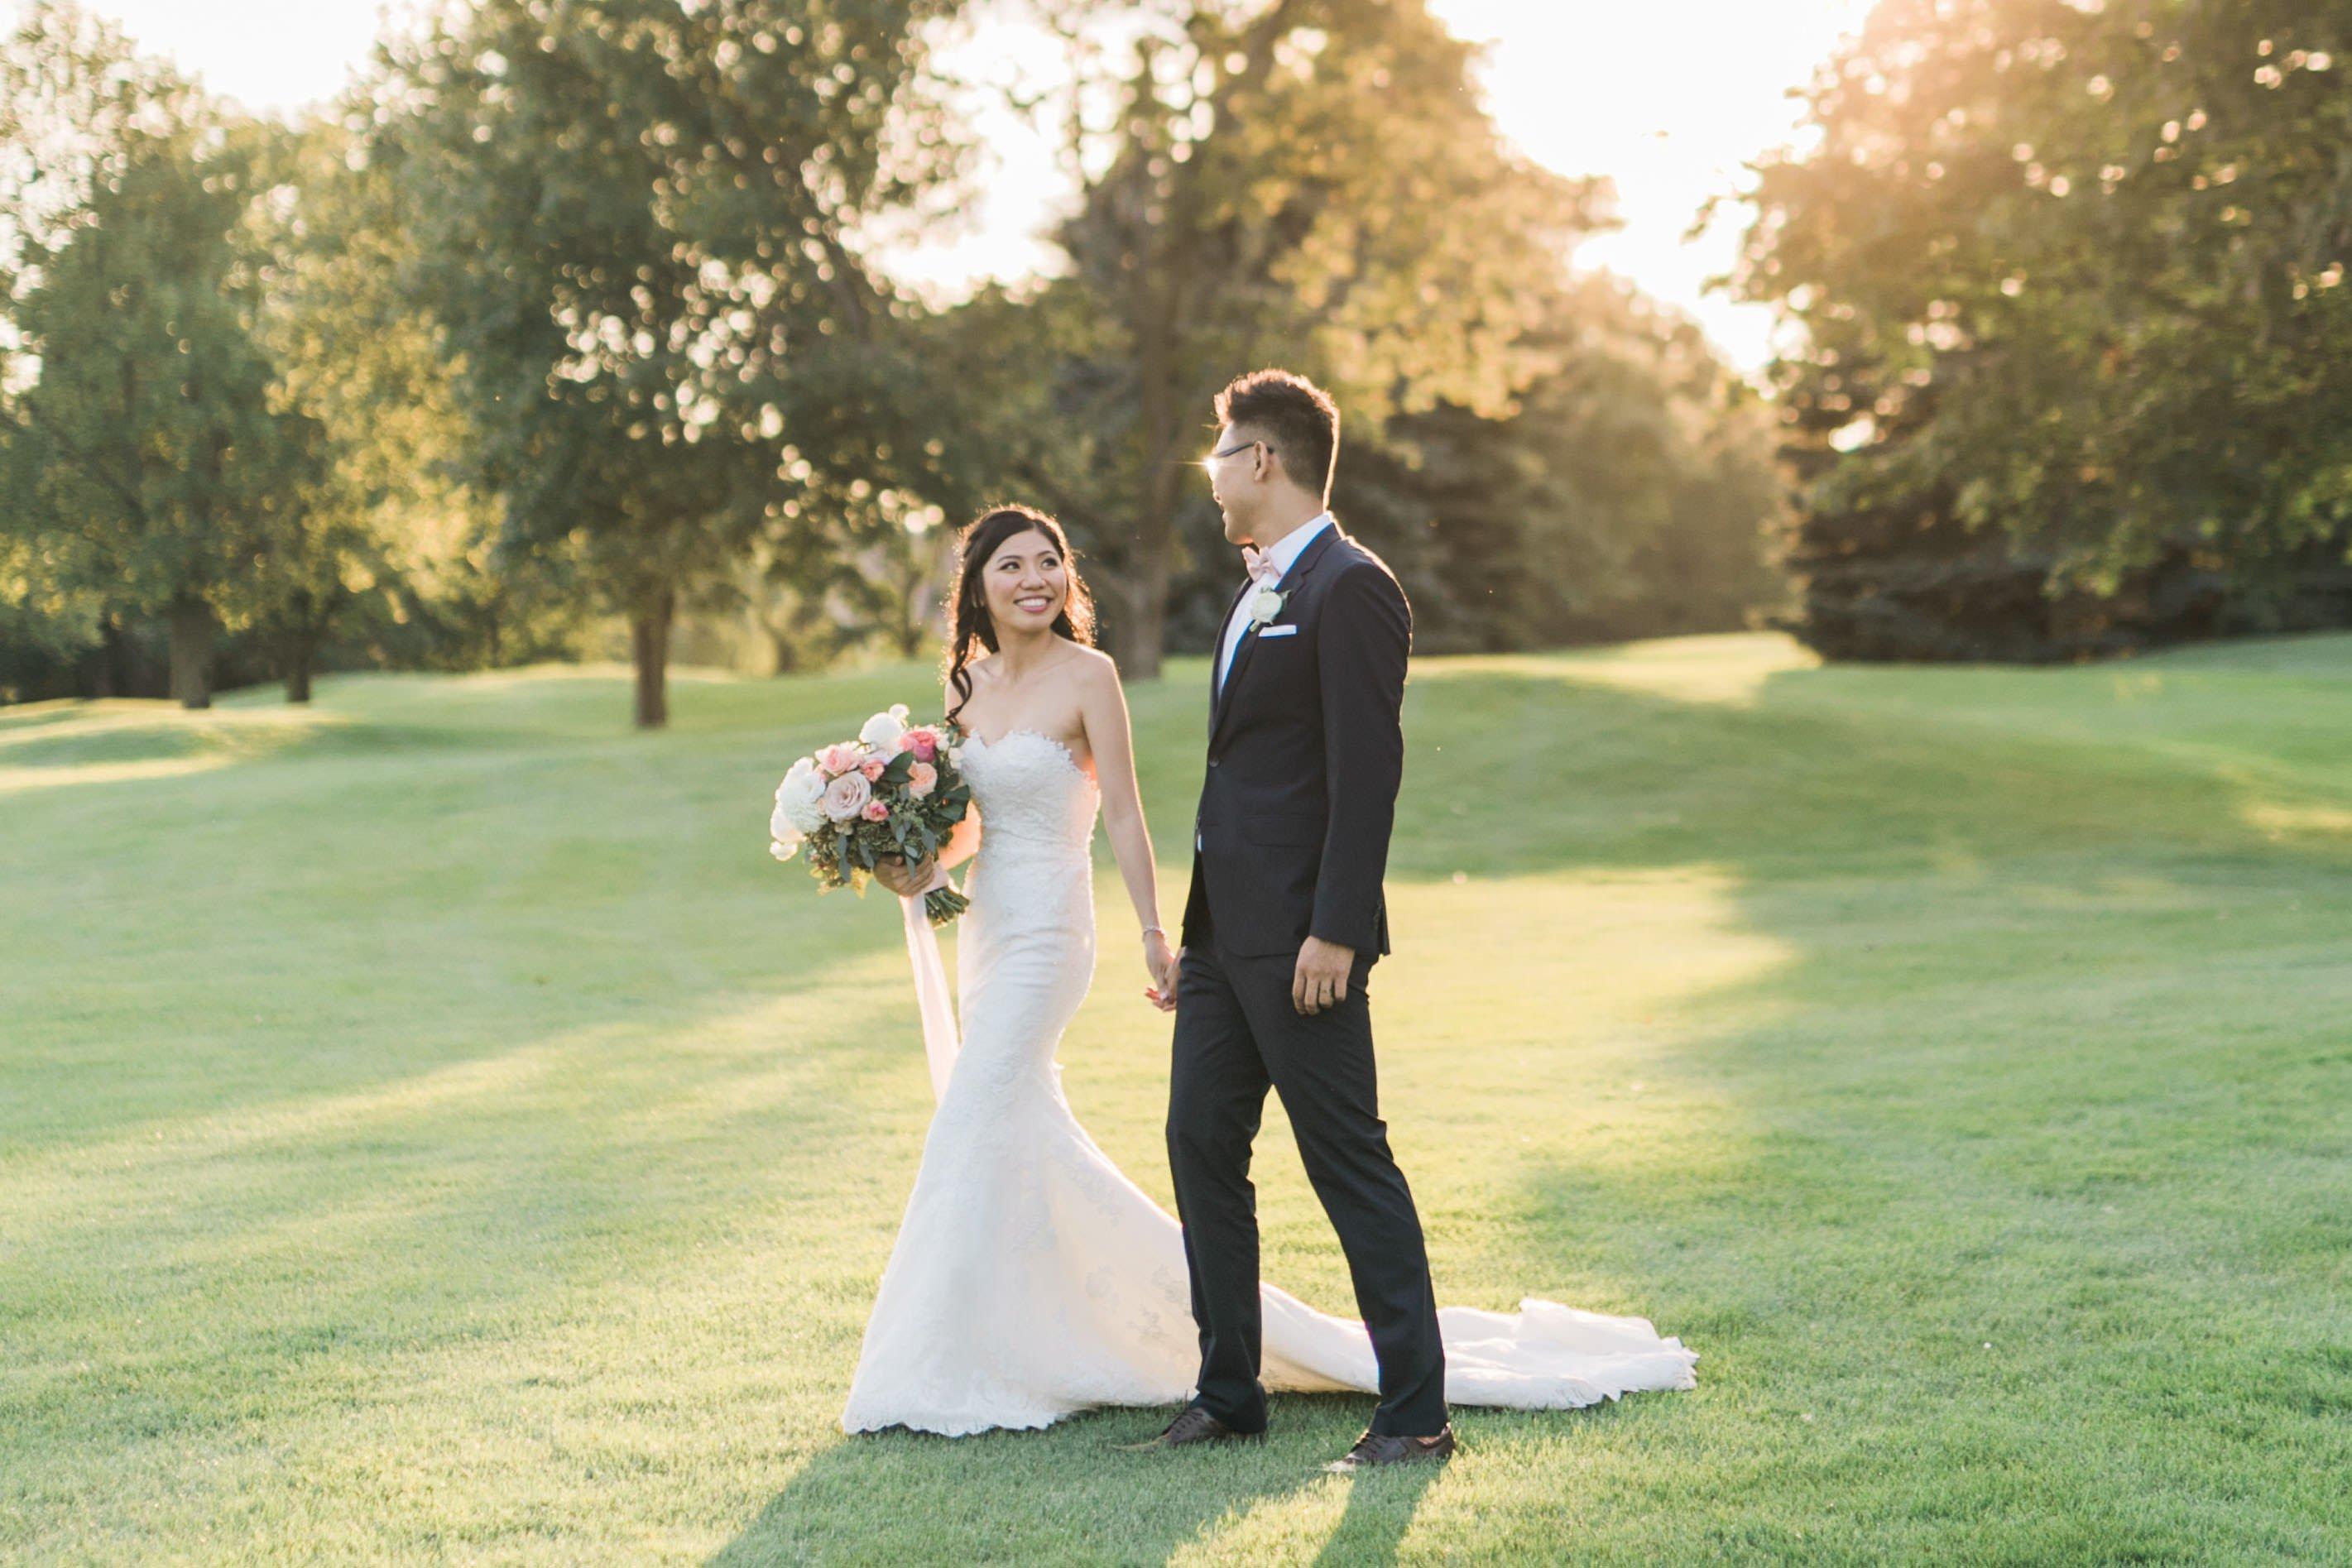 Richmond_Hill_Country_Club_Wedding_Photos-Rhythm_Photography